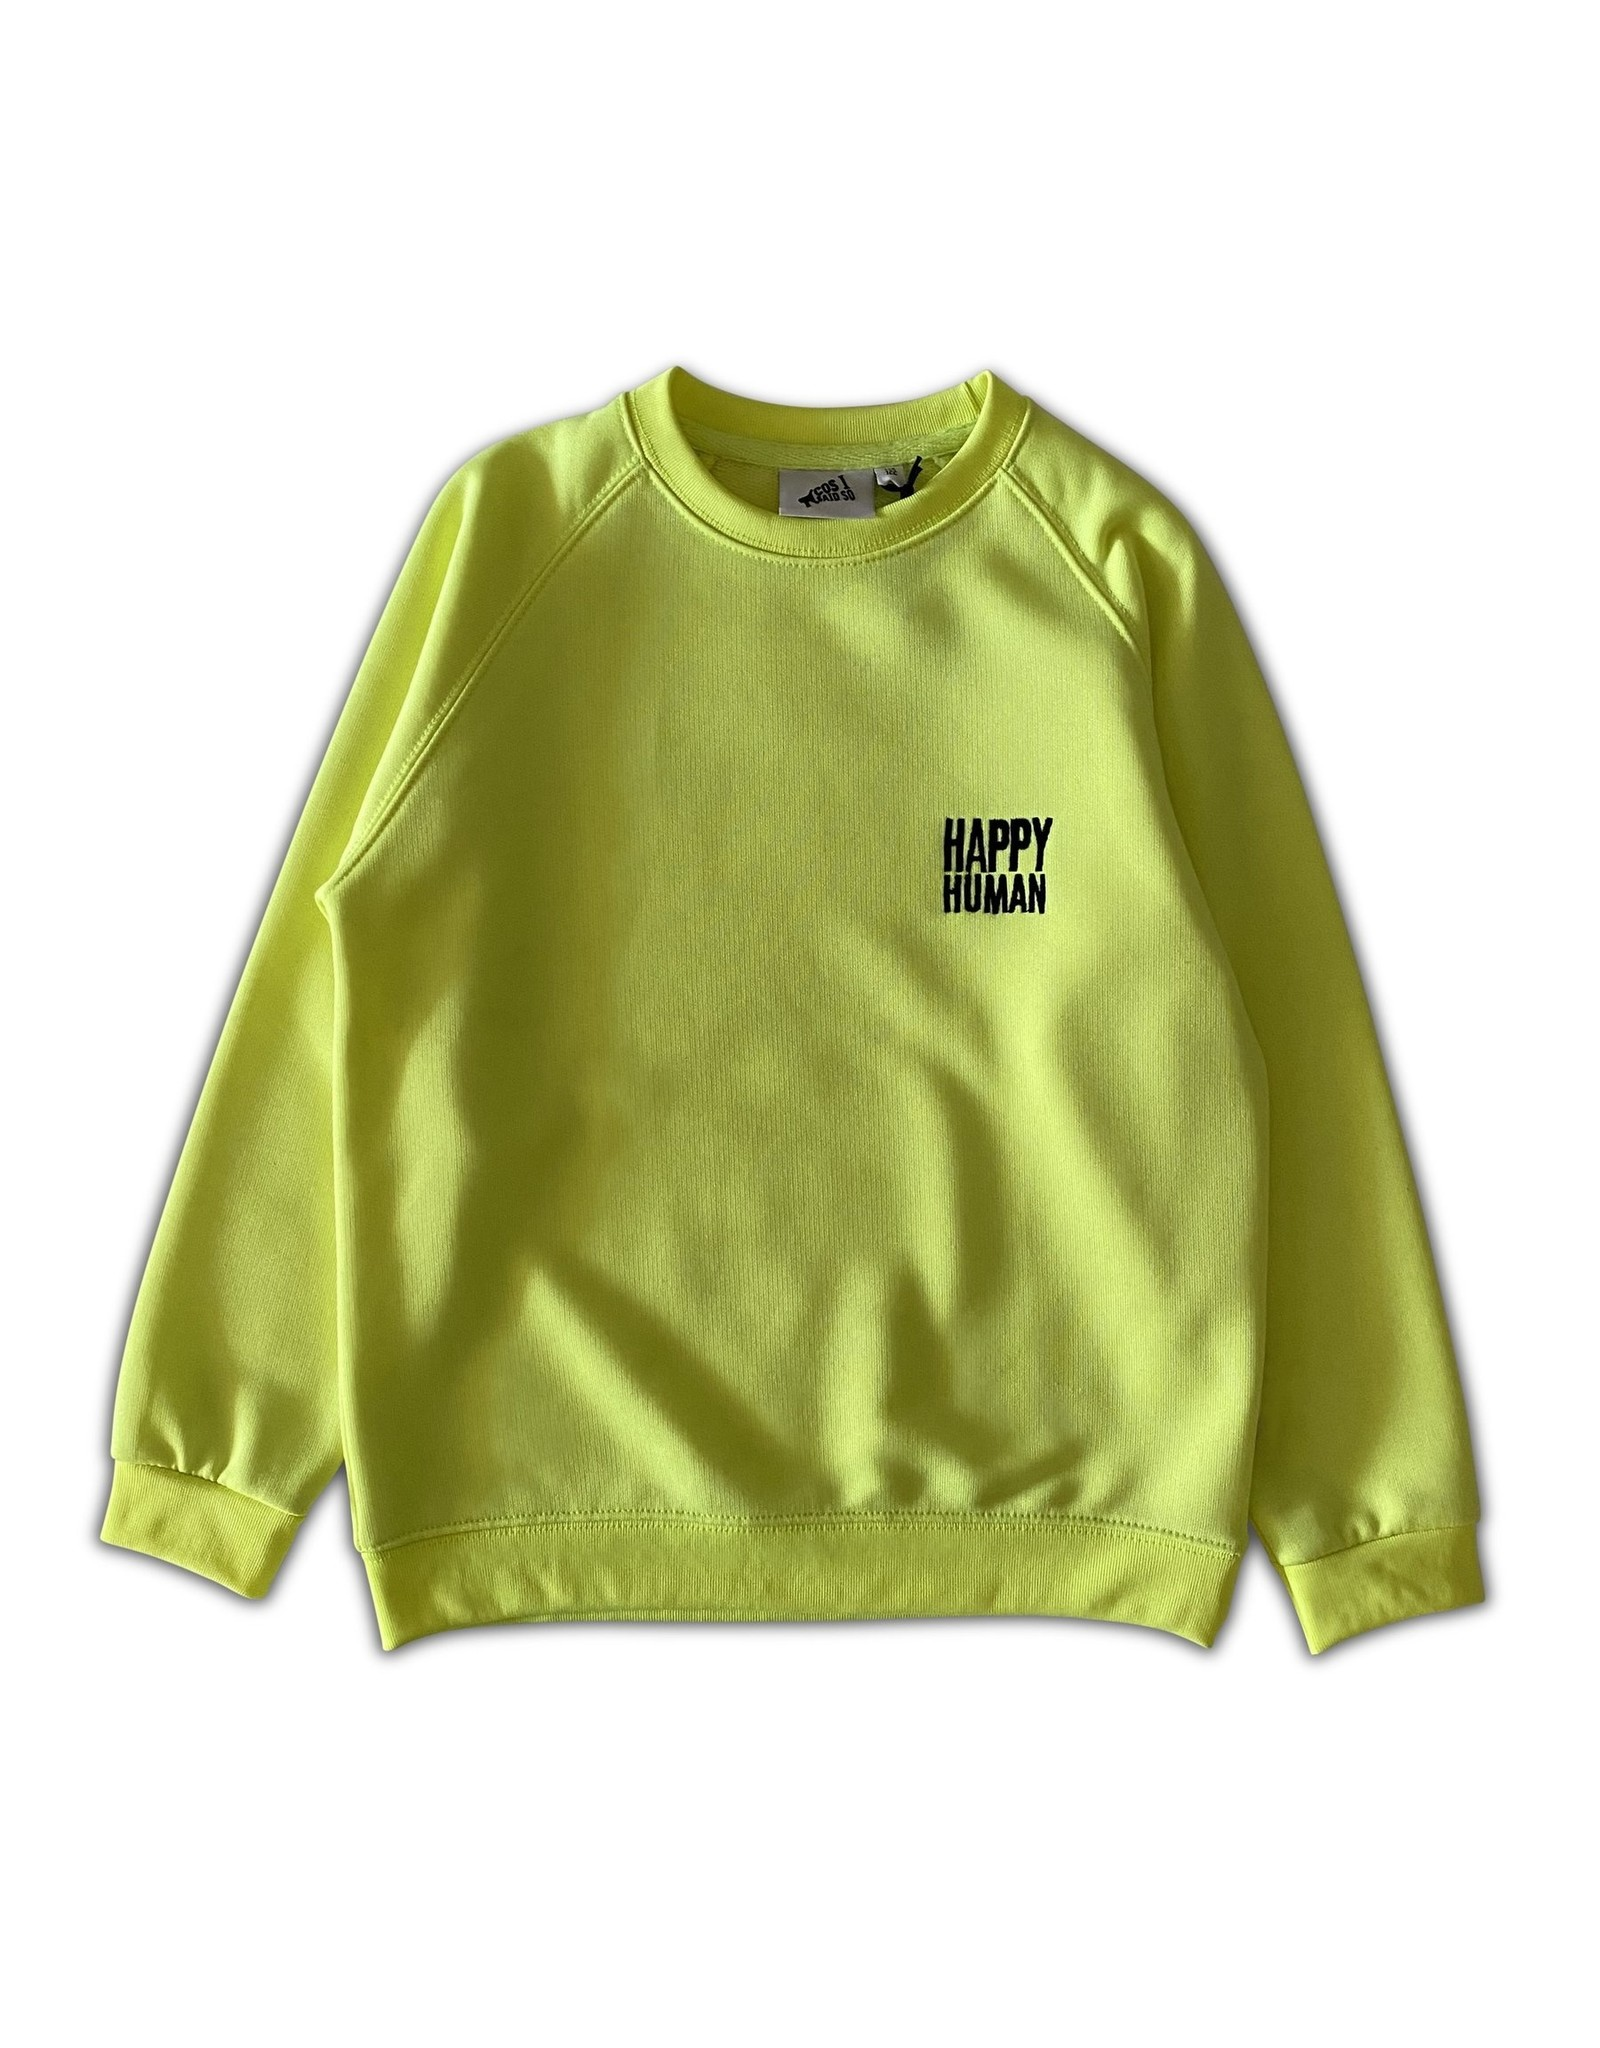 Cos I Sais So Cos I Said So Happy Human Sweater NEON